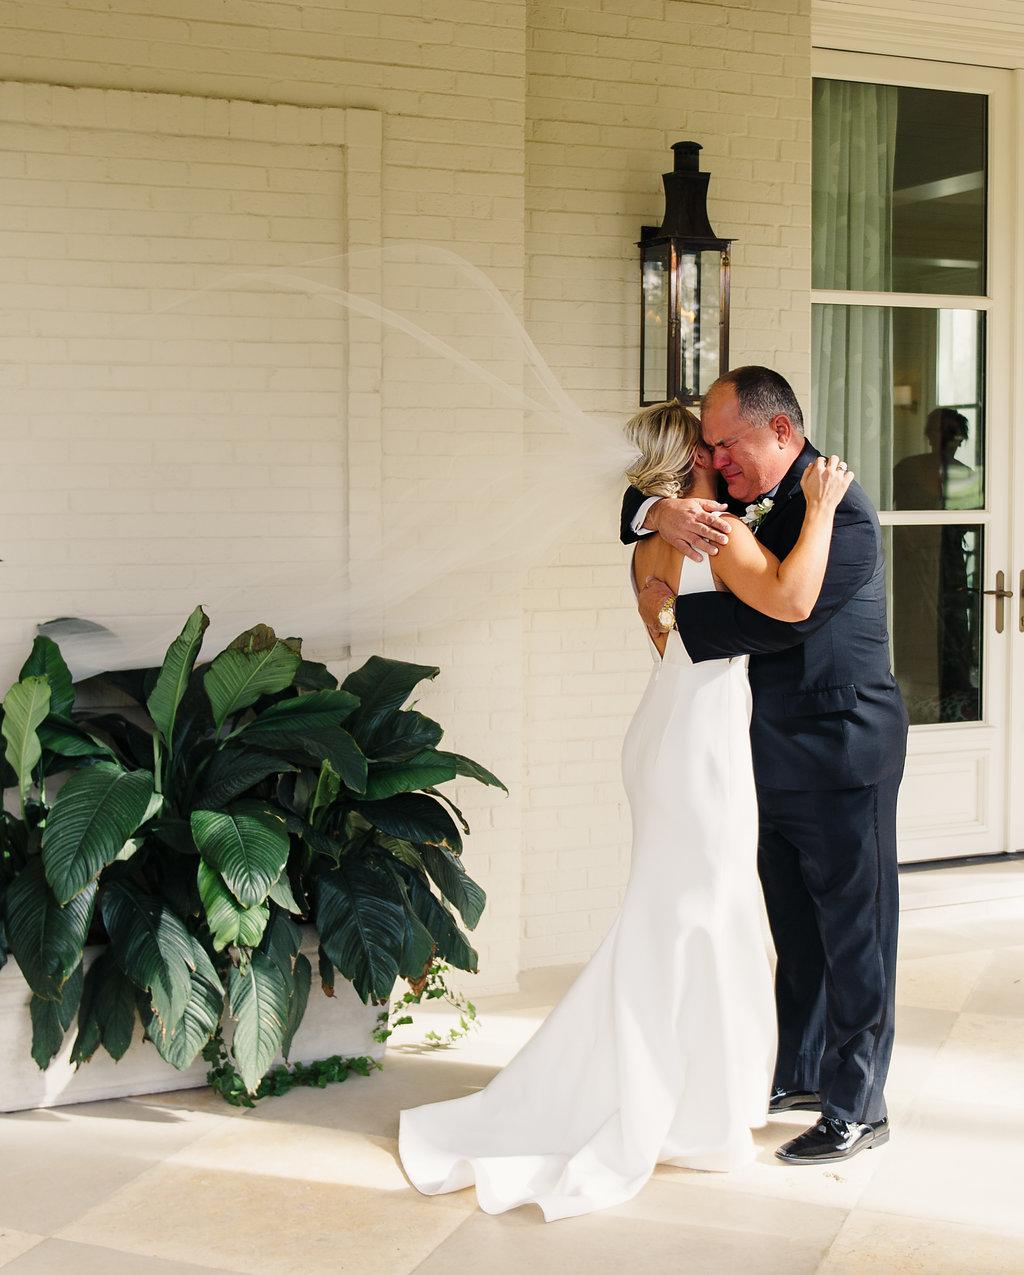 HeartoftheRanch.FtWorth.Wedding.LC.592.jpg